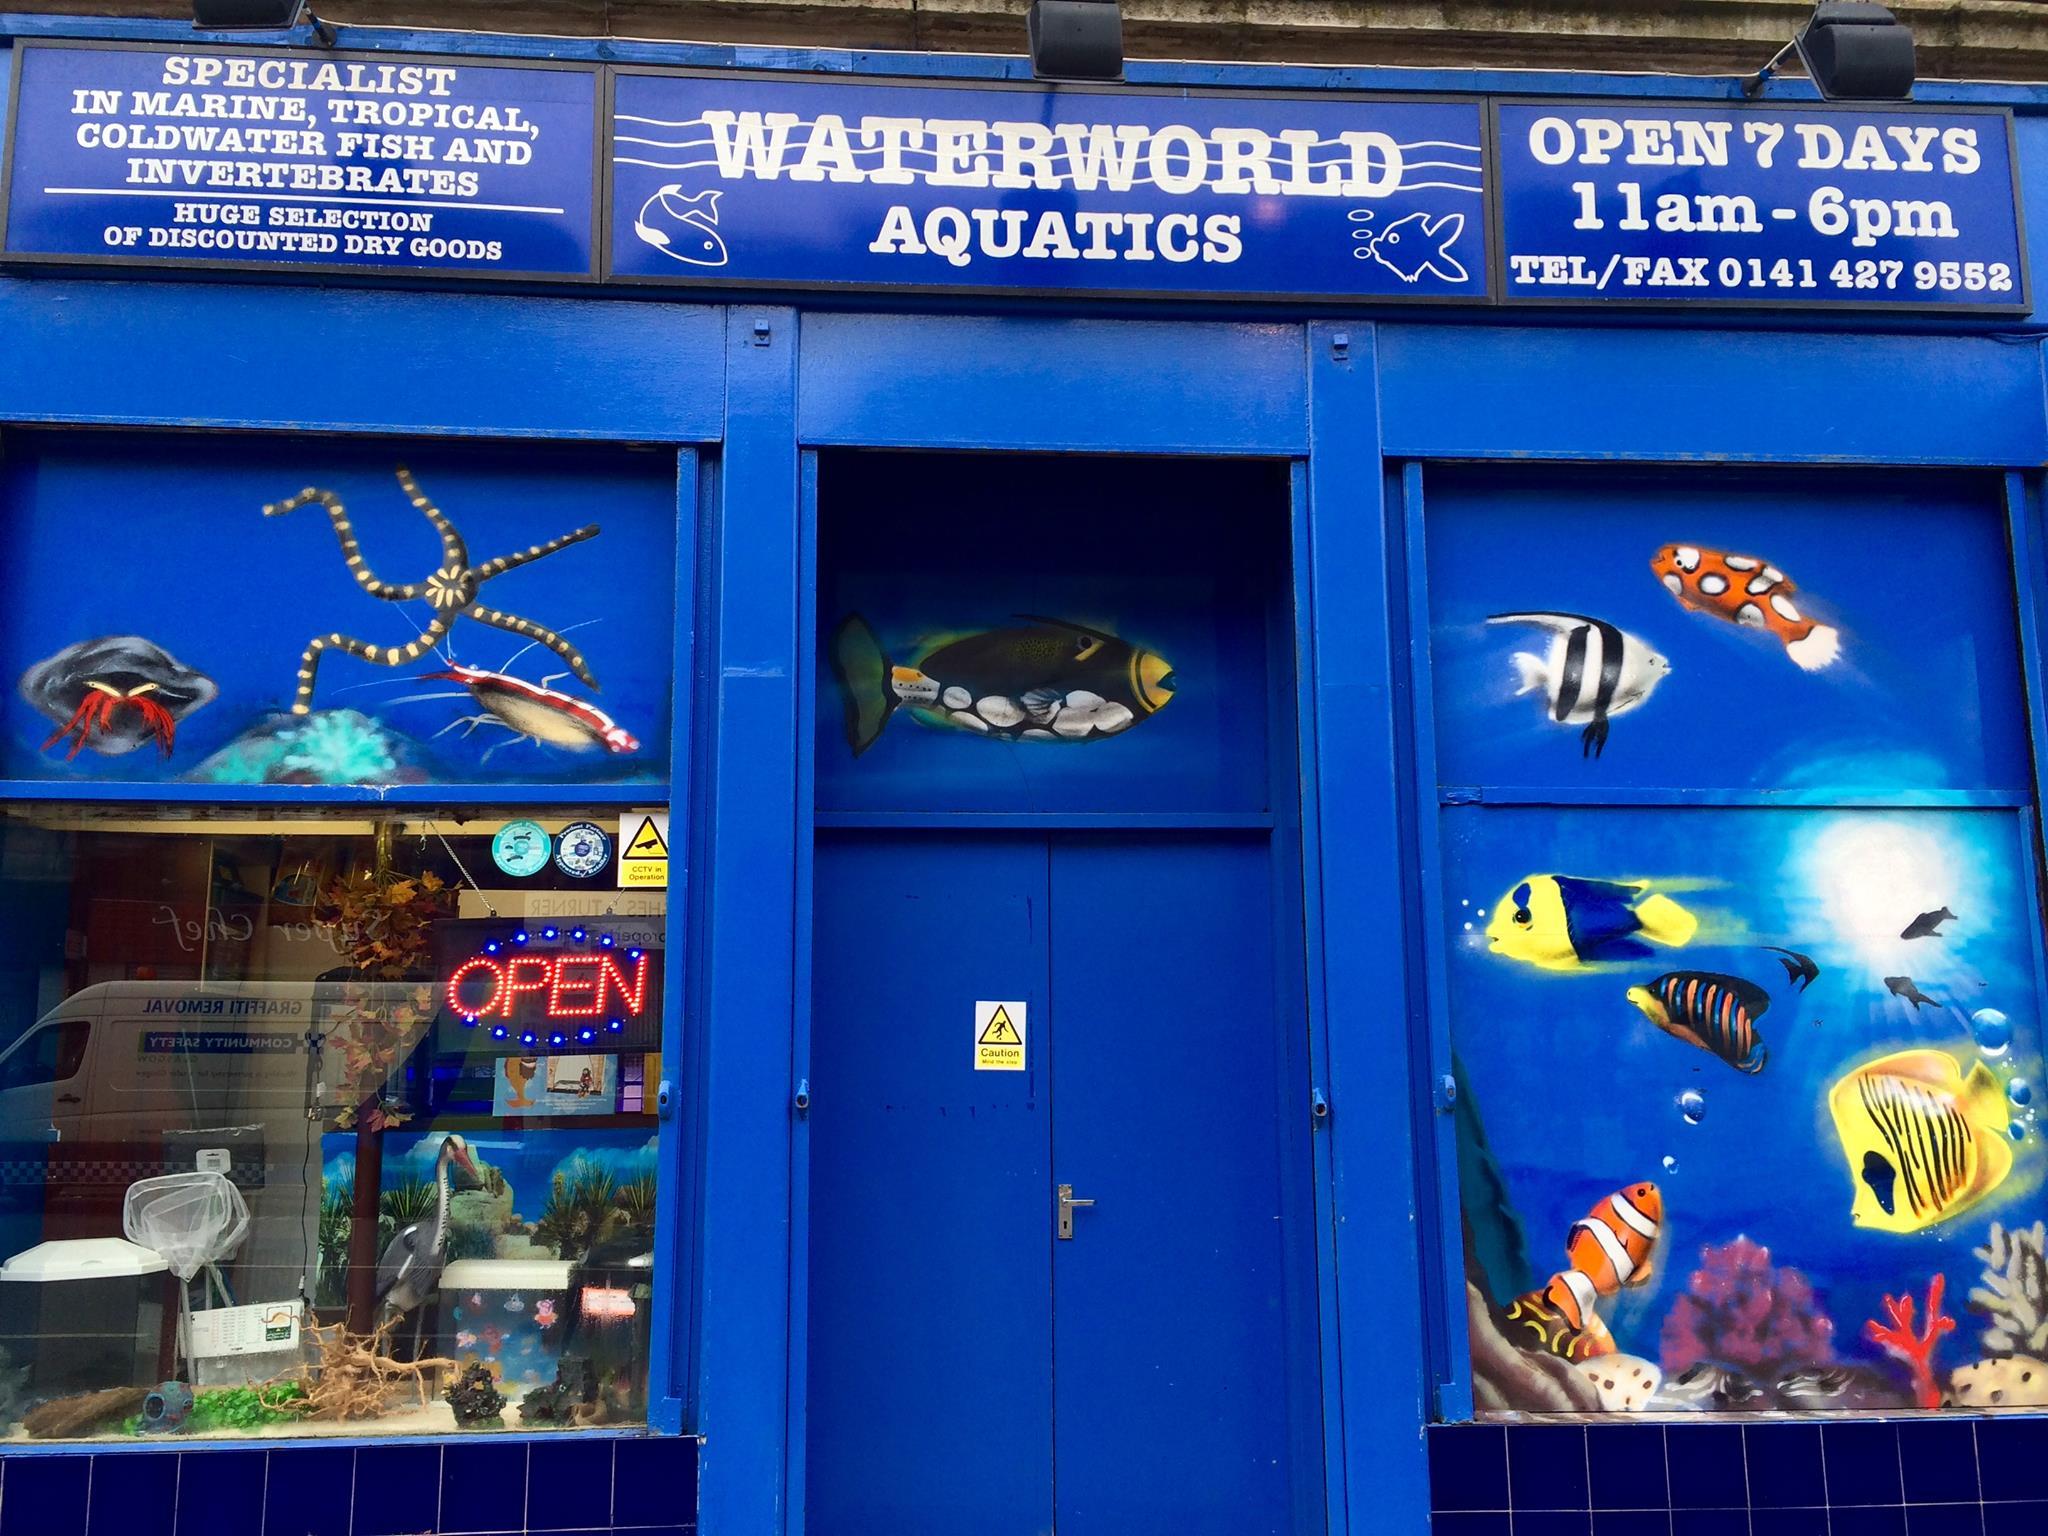 Waterworld Aquatics Glasgow Tropical Marine Livestock